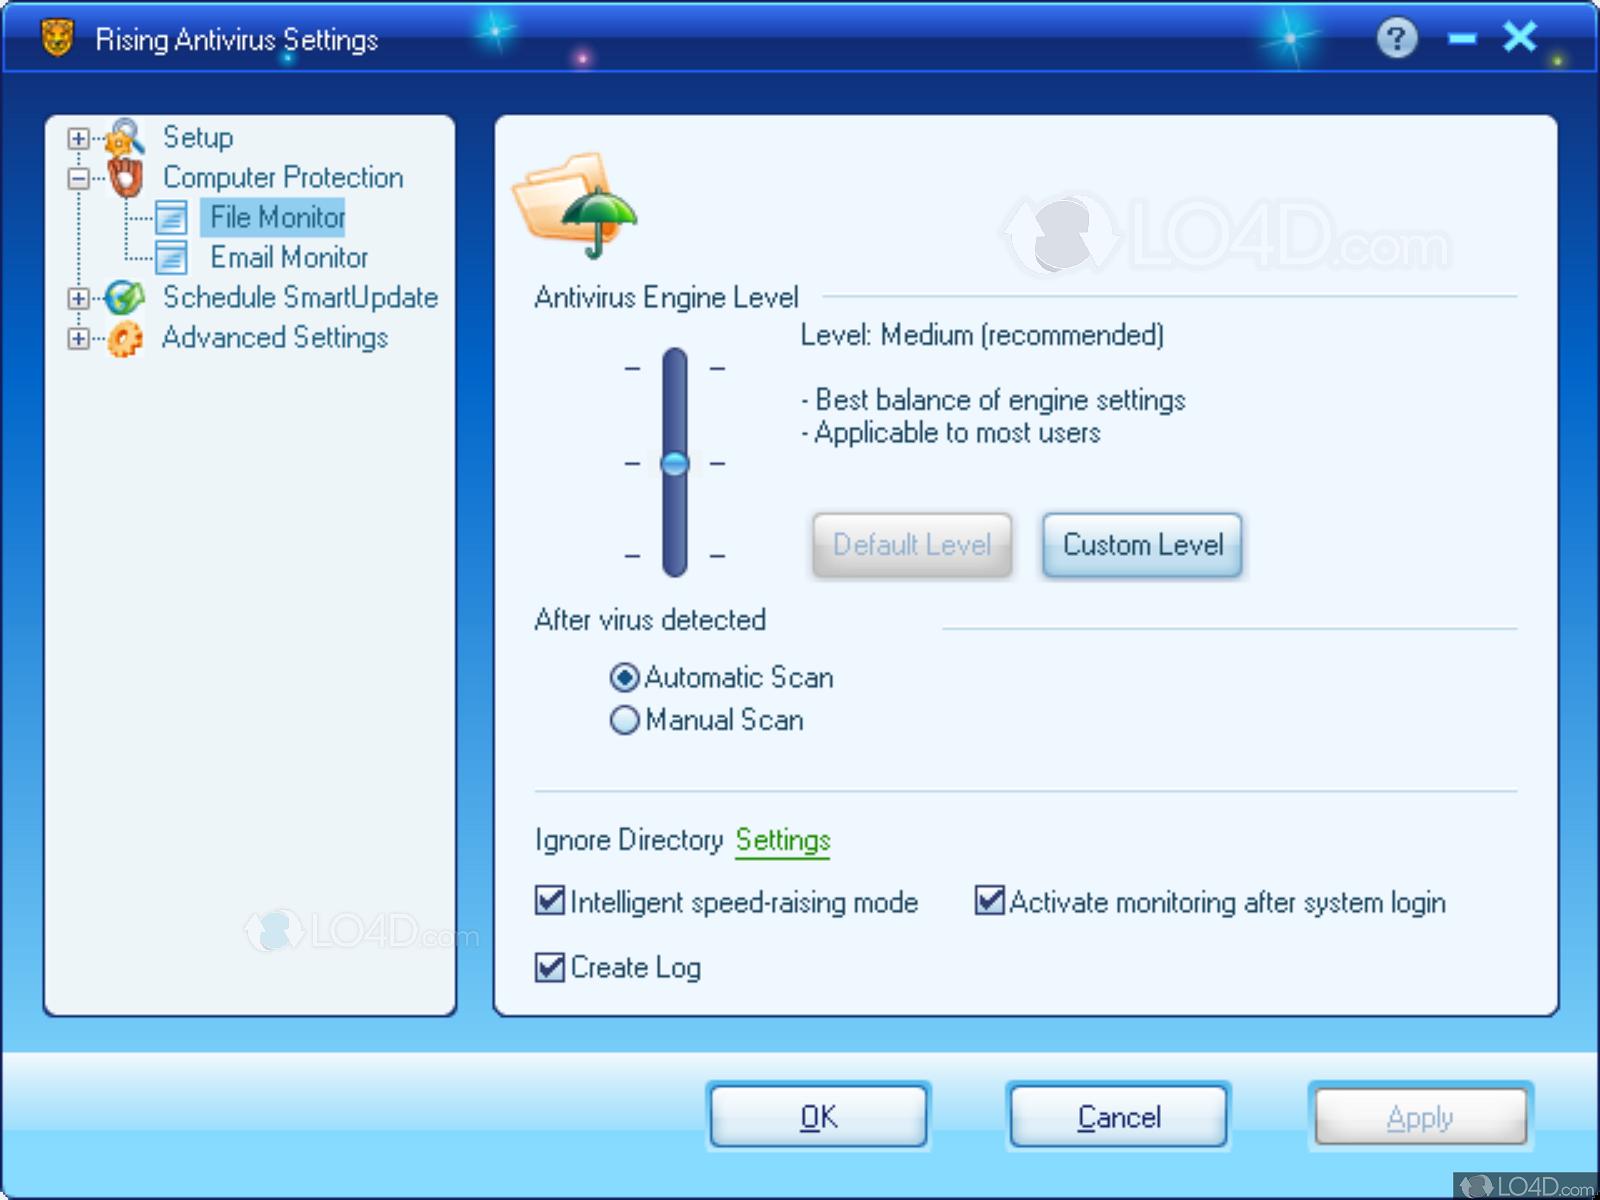 Rising antivirus free edition download.